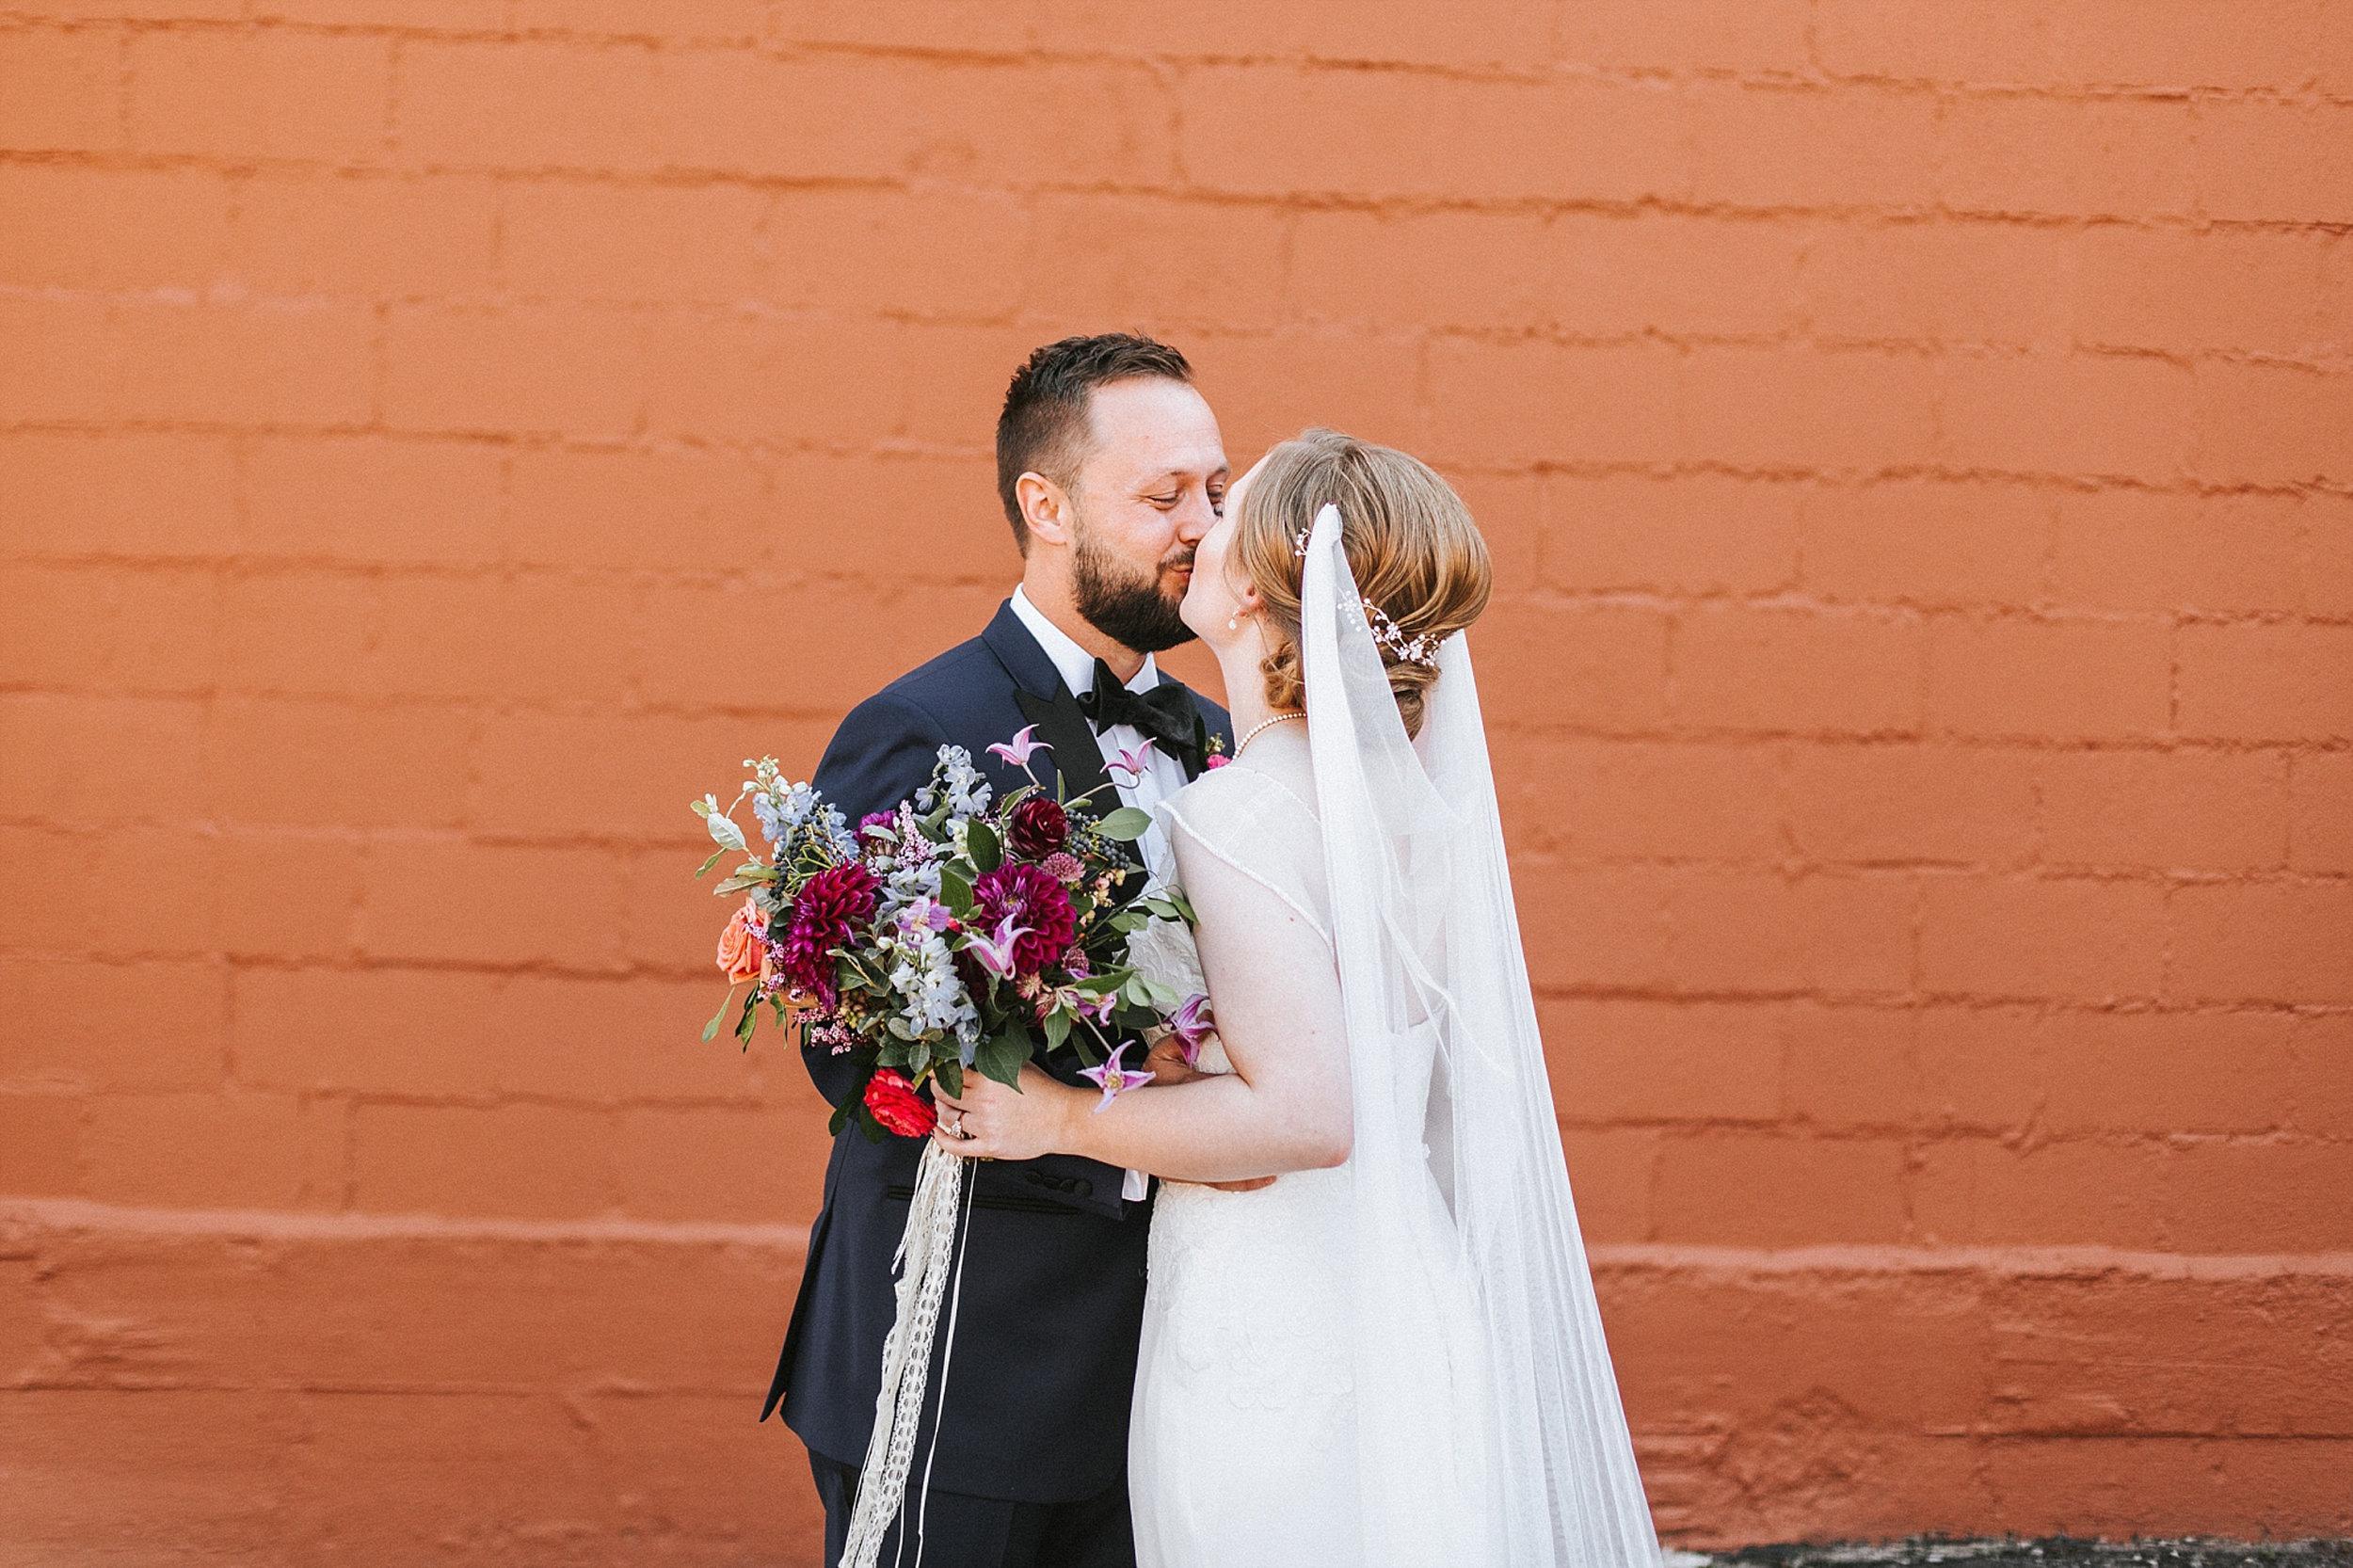 Brooke Townsend Photography - Ohio Wedding Photographer-43.jpg